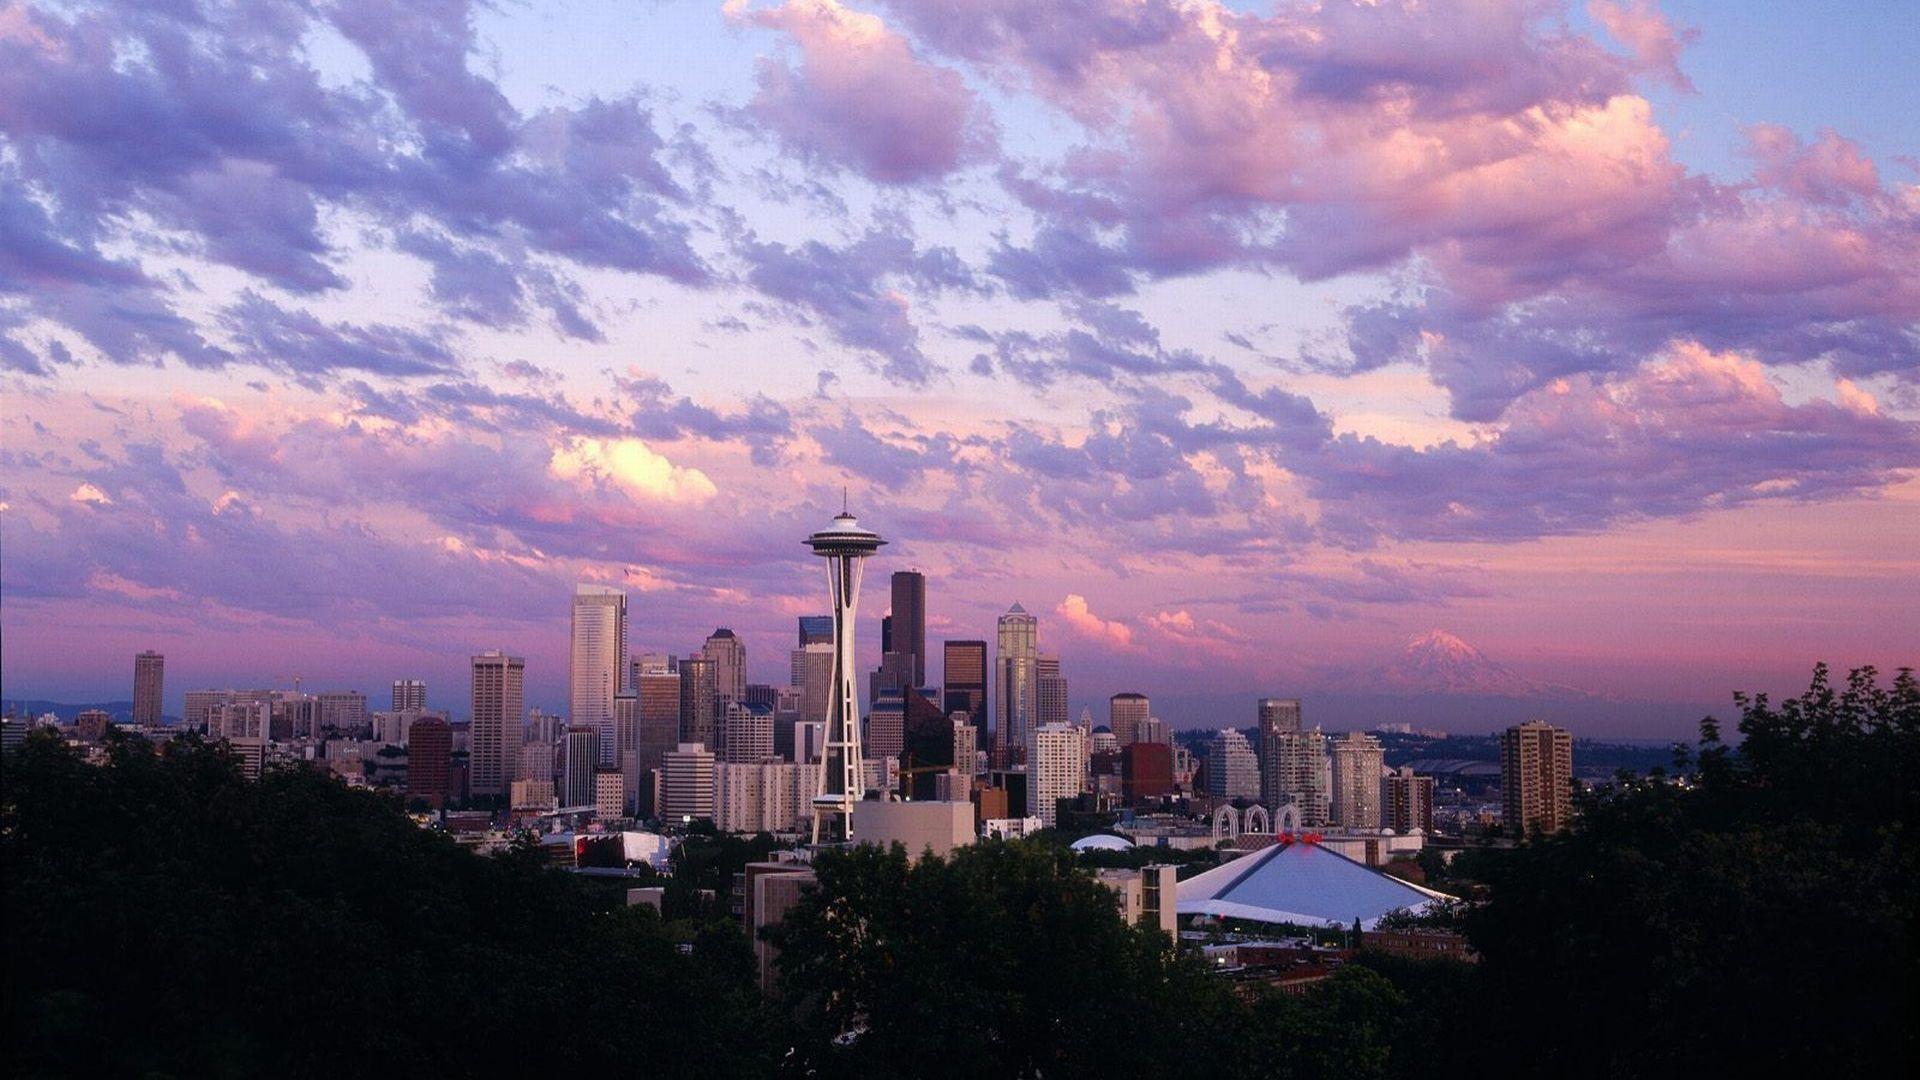 45 Seattle 1080p Wallpaper On Wallpapersafari